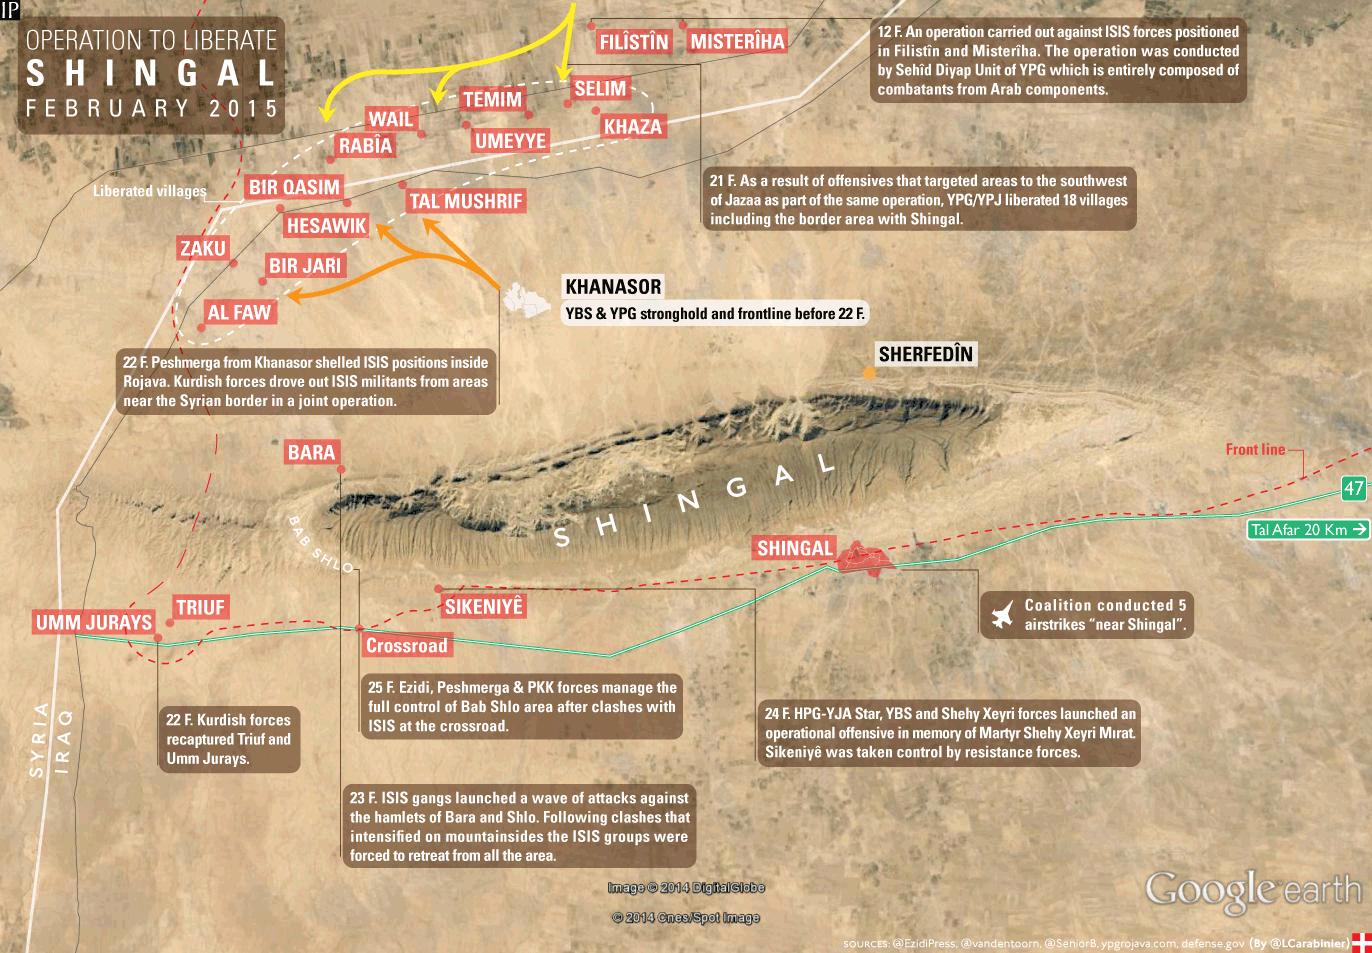 Début de révolte en Irak? - Page 7 B_HmIQ7WkAAXapl